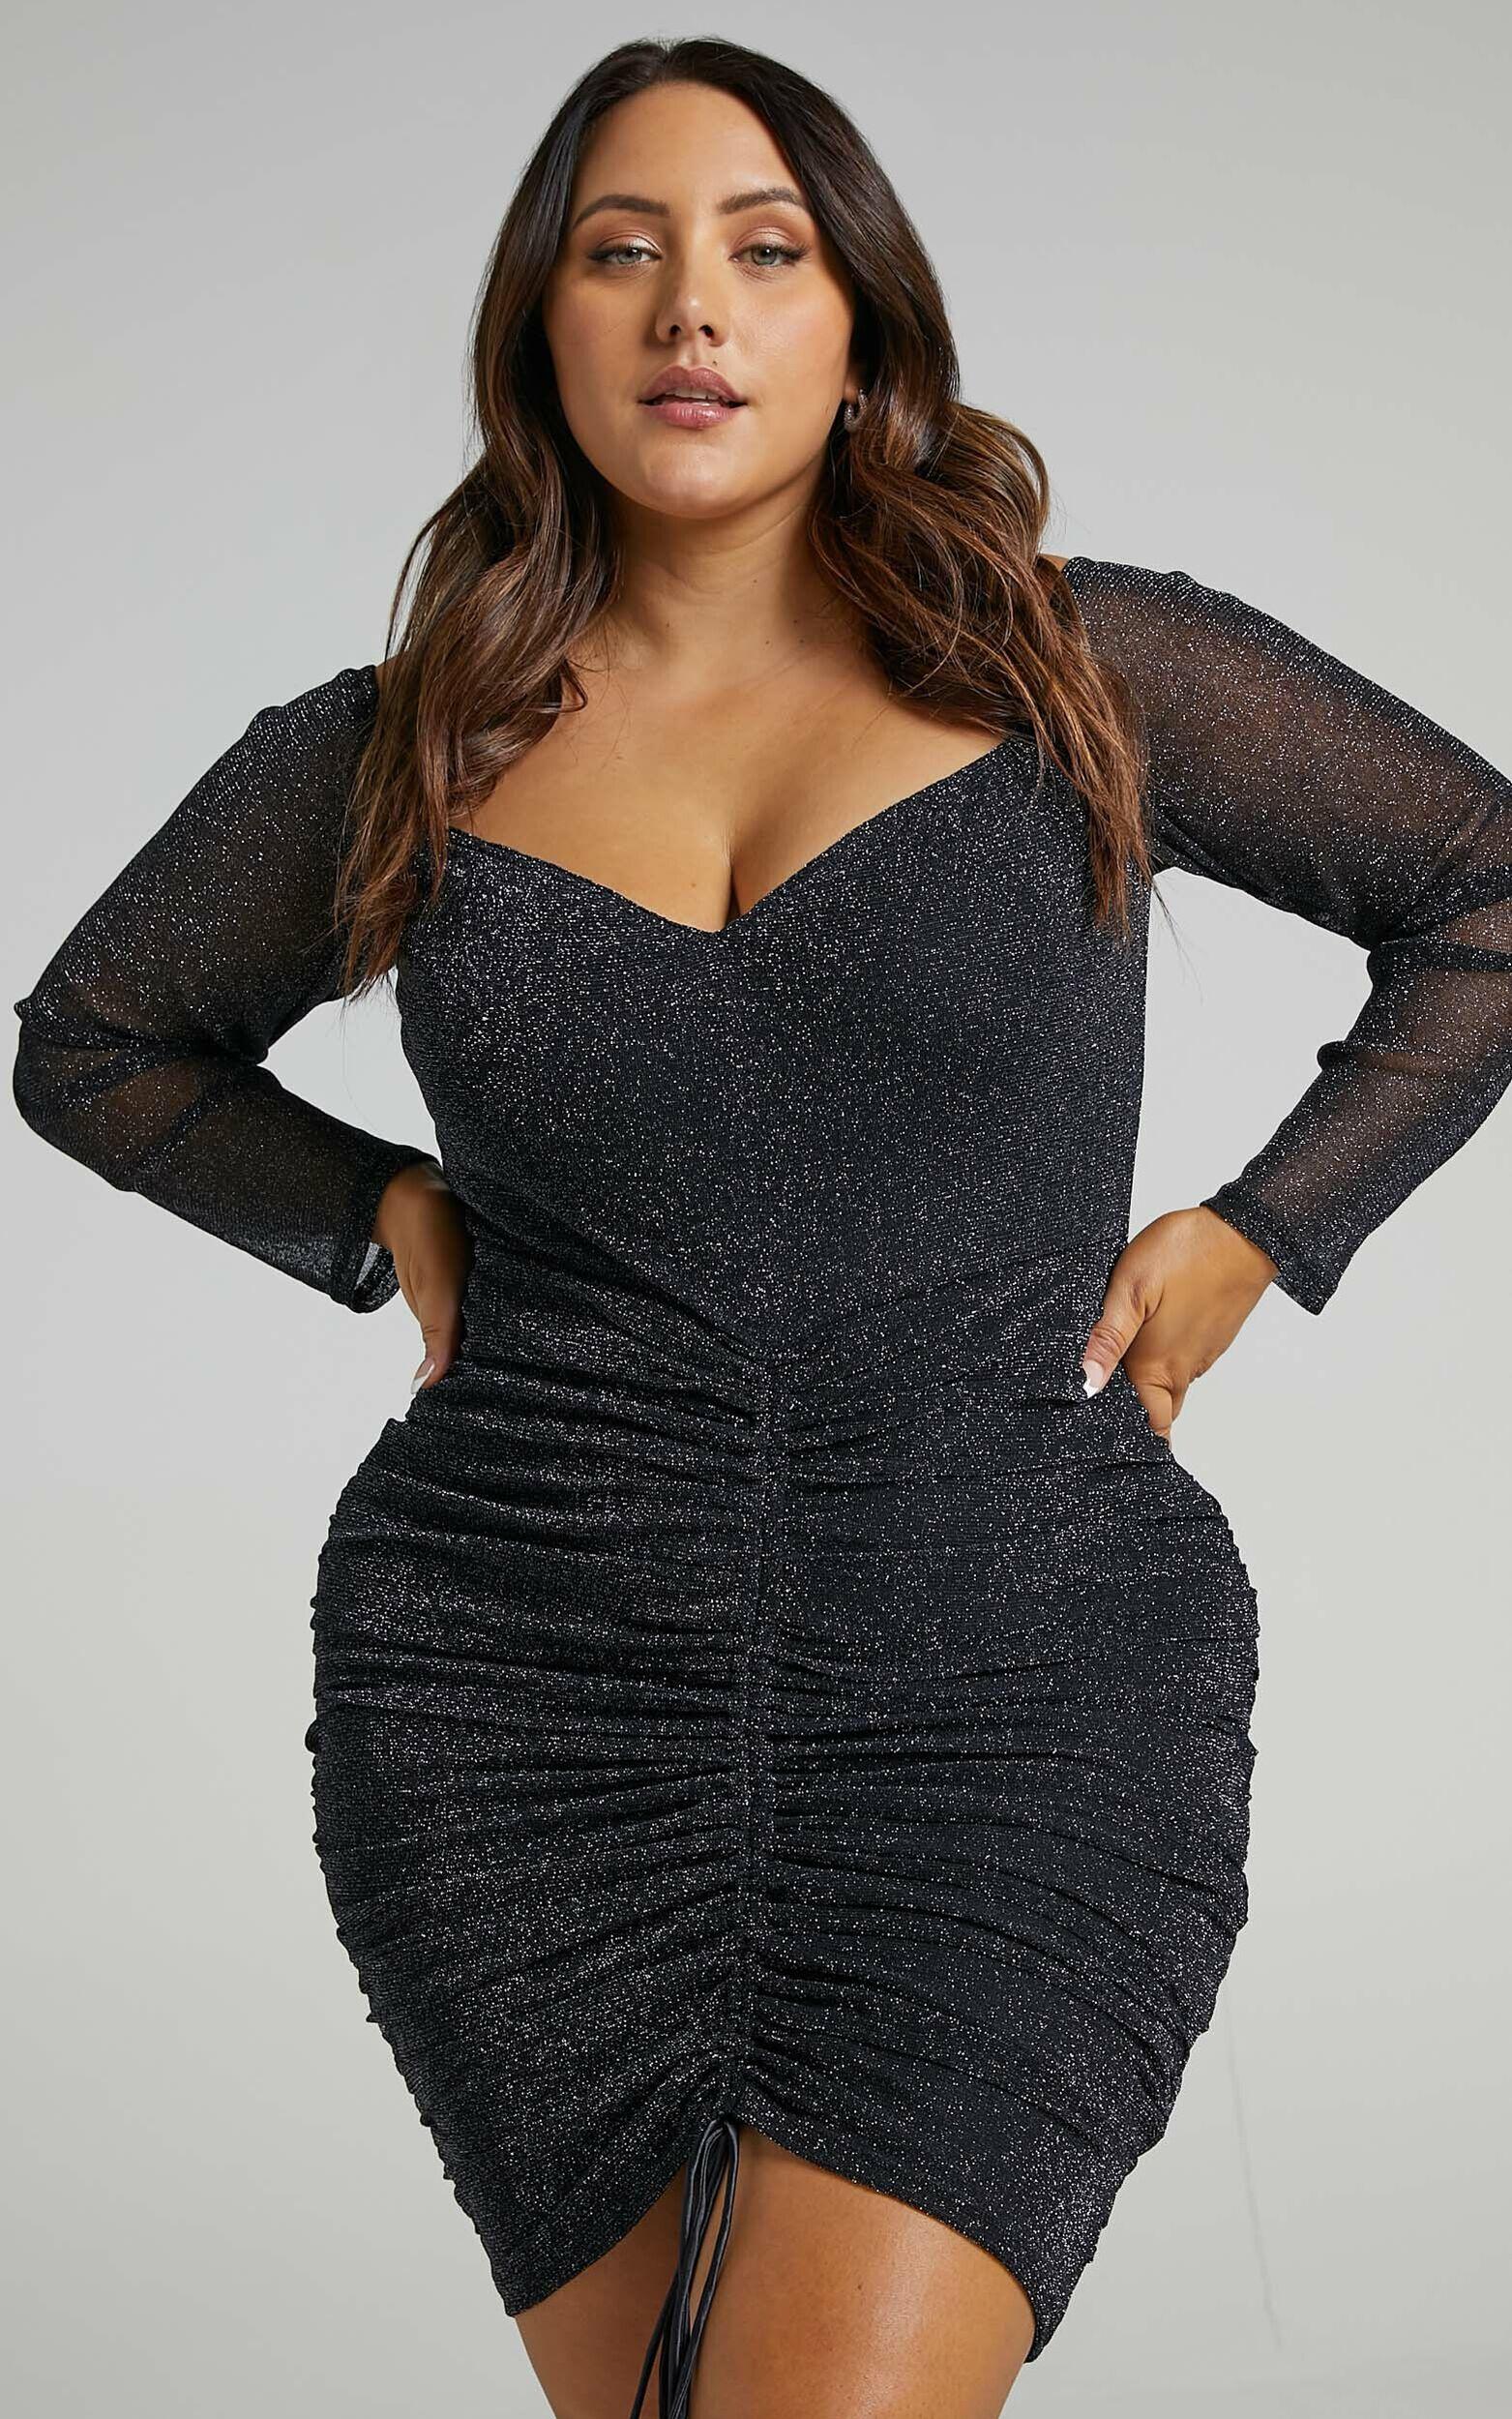 When I Get Home Dress in black mesh lurex - 20 (XXXXL), Black, super-hi-res image number null